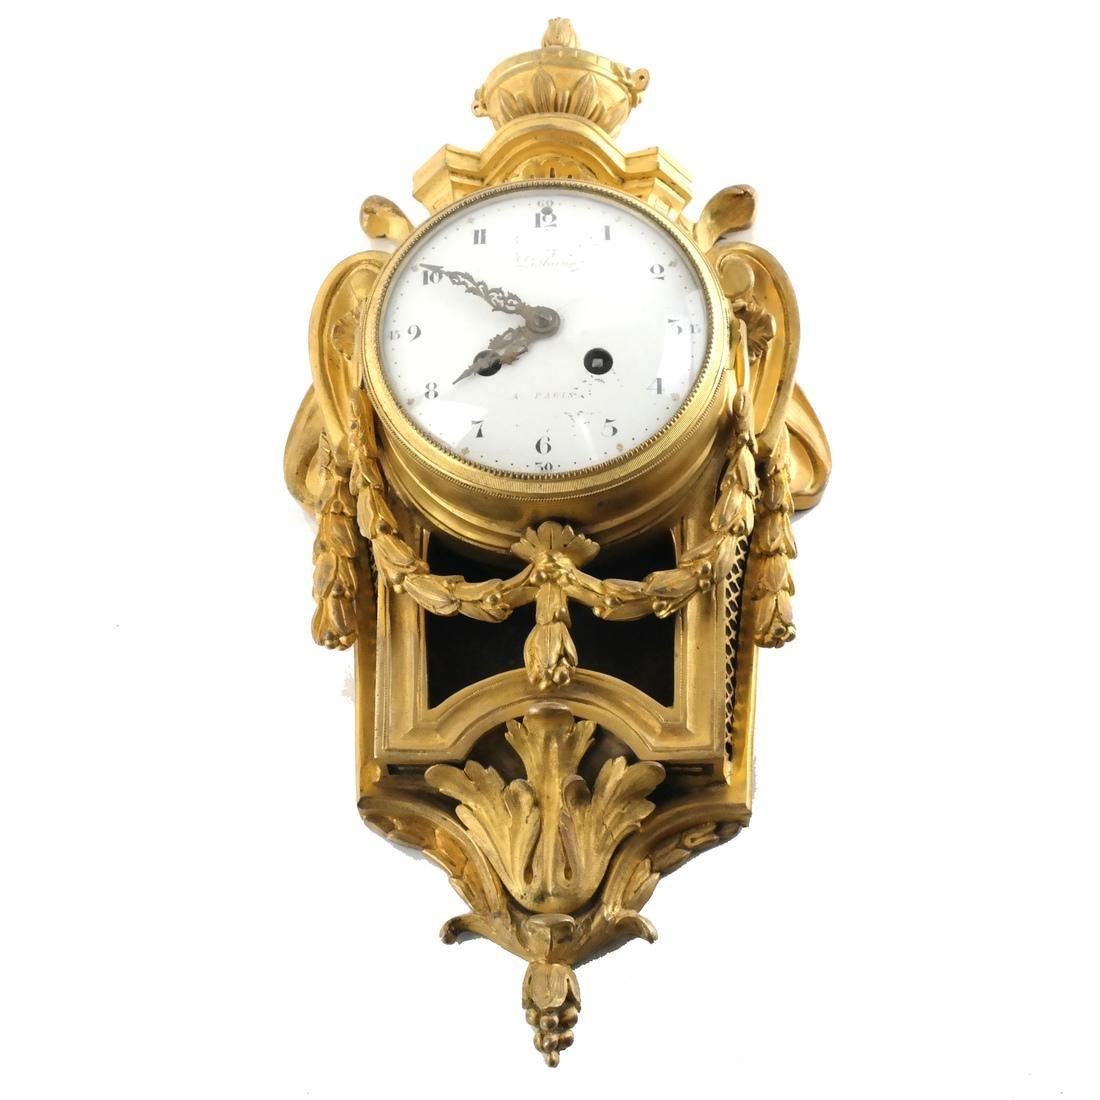 Antique French Bronze Dore Cartel Clock - 2